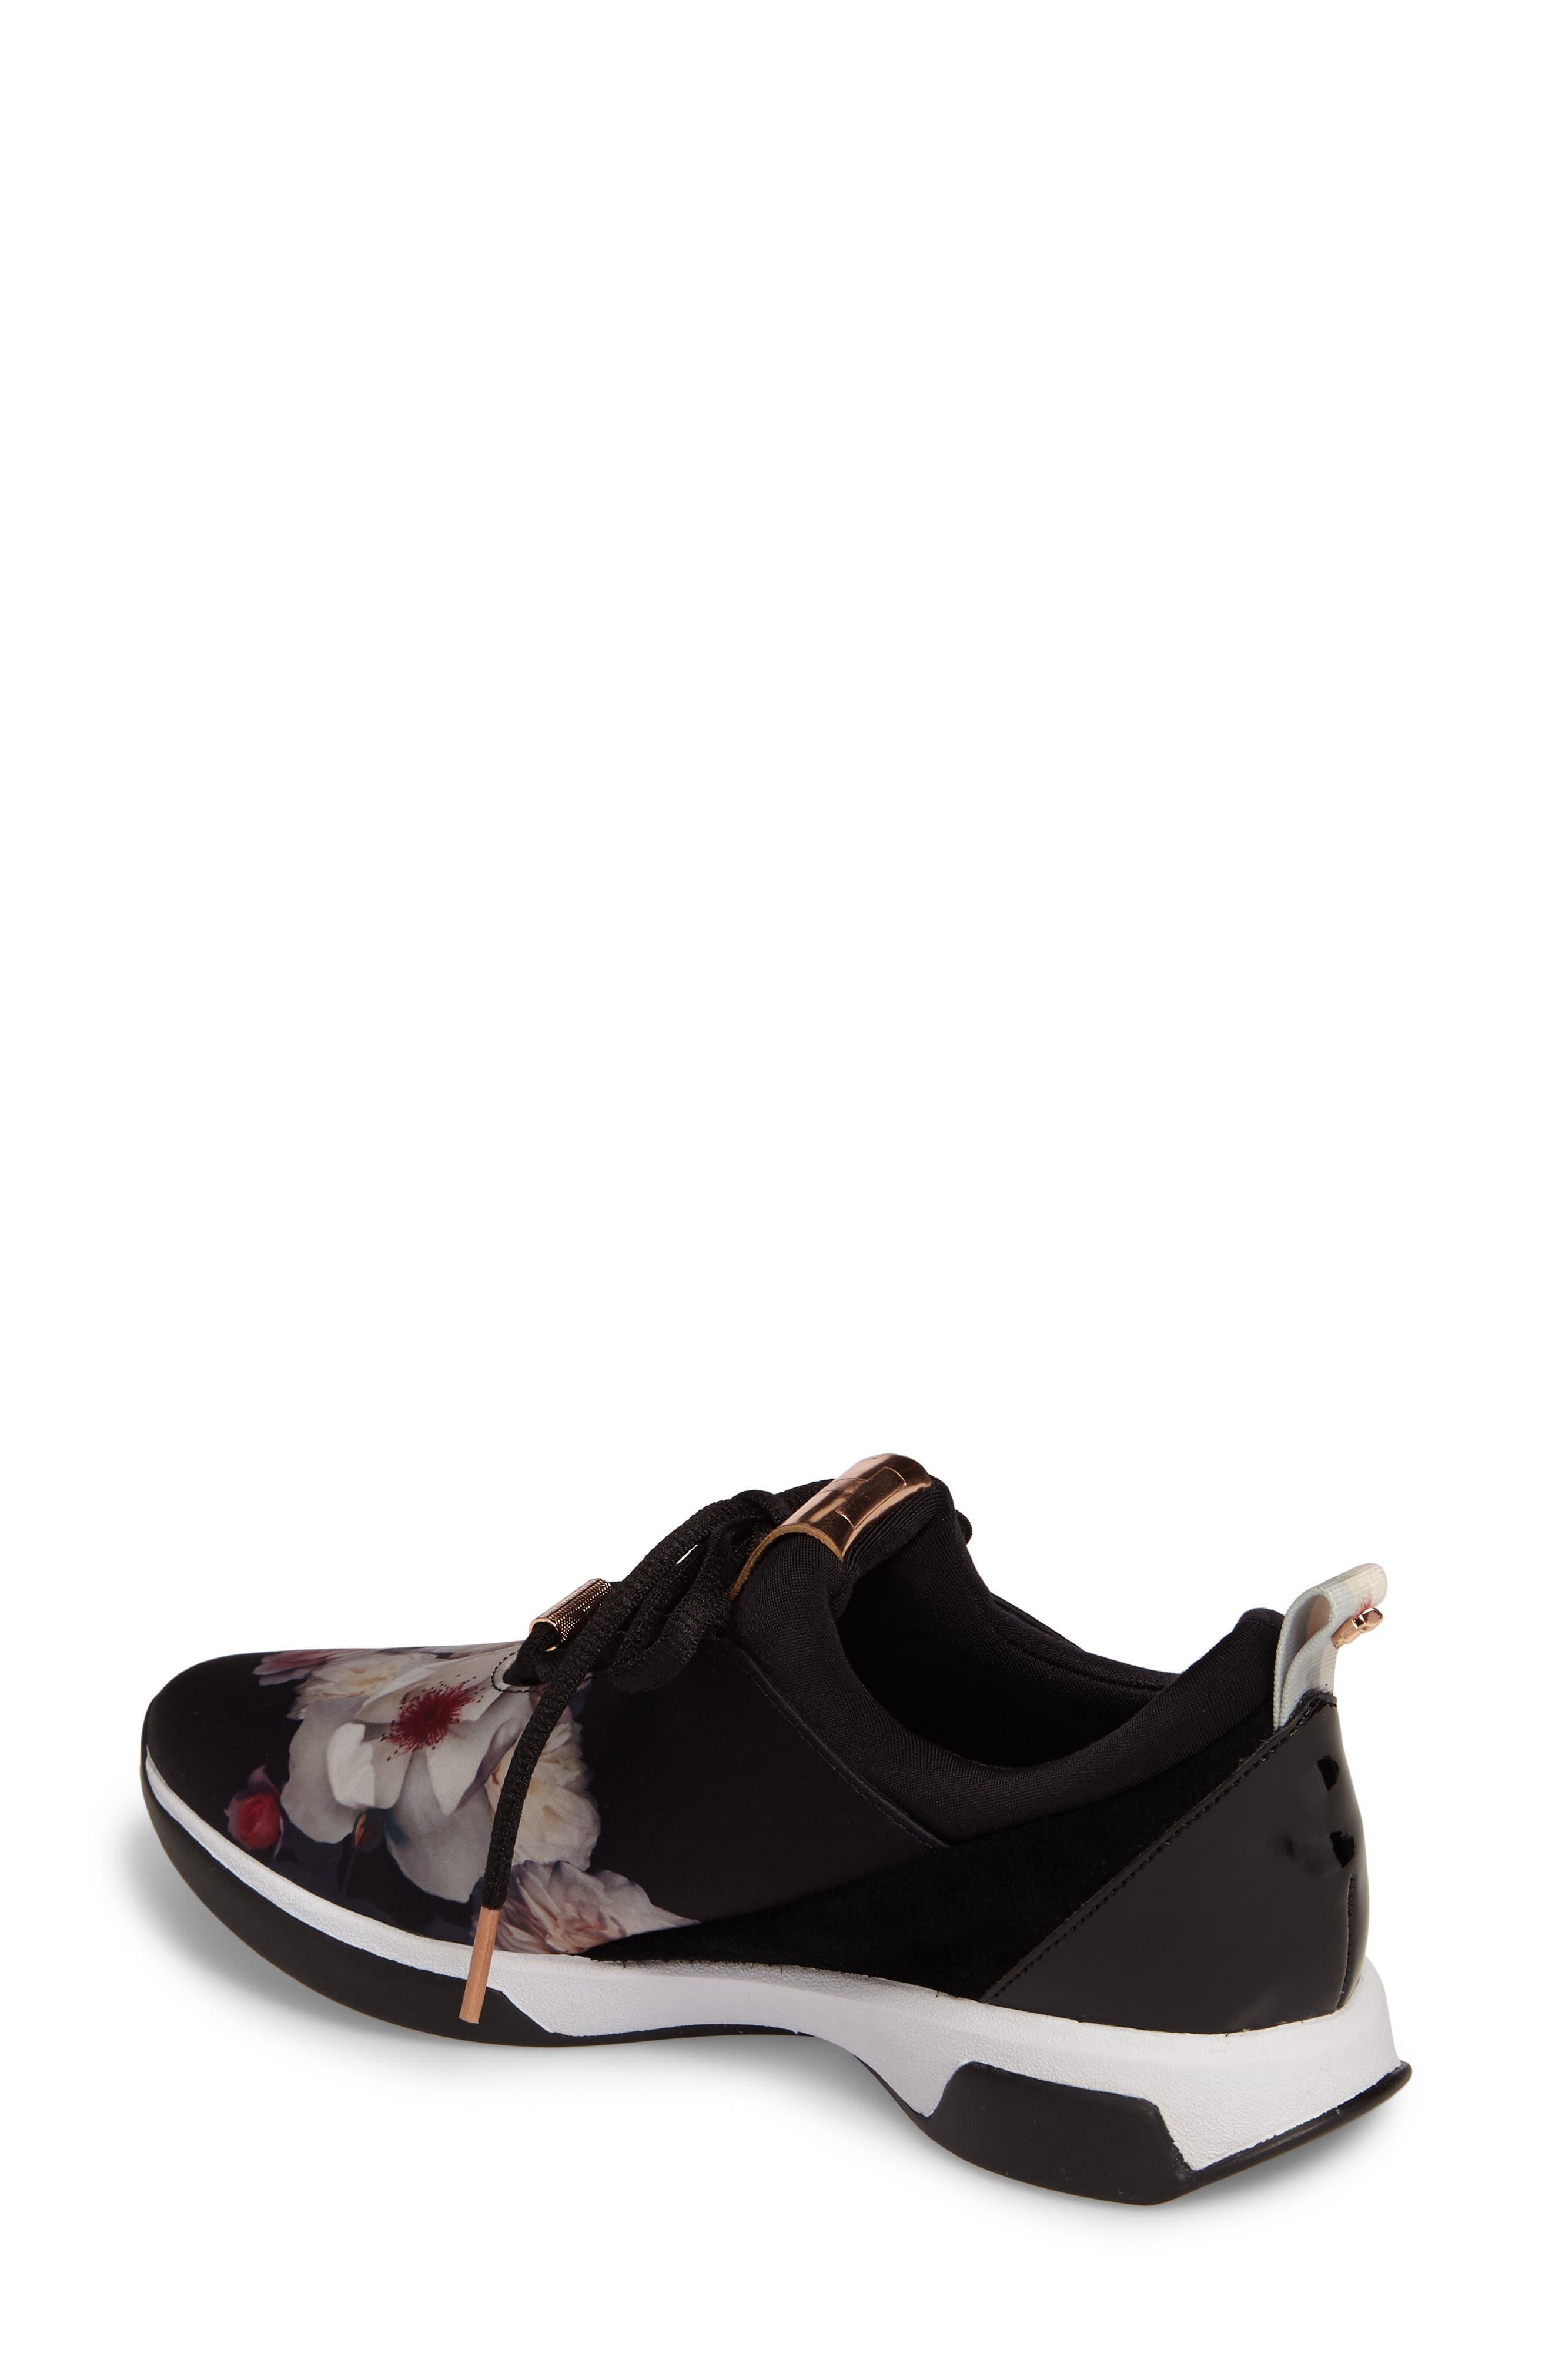 Cepape Floral Sneaker,                             Alternate thumbnail 2, color,